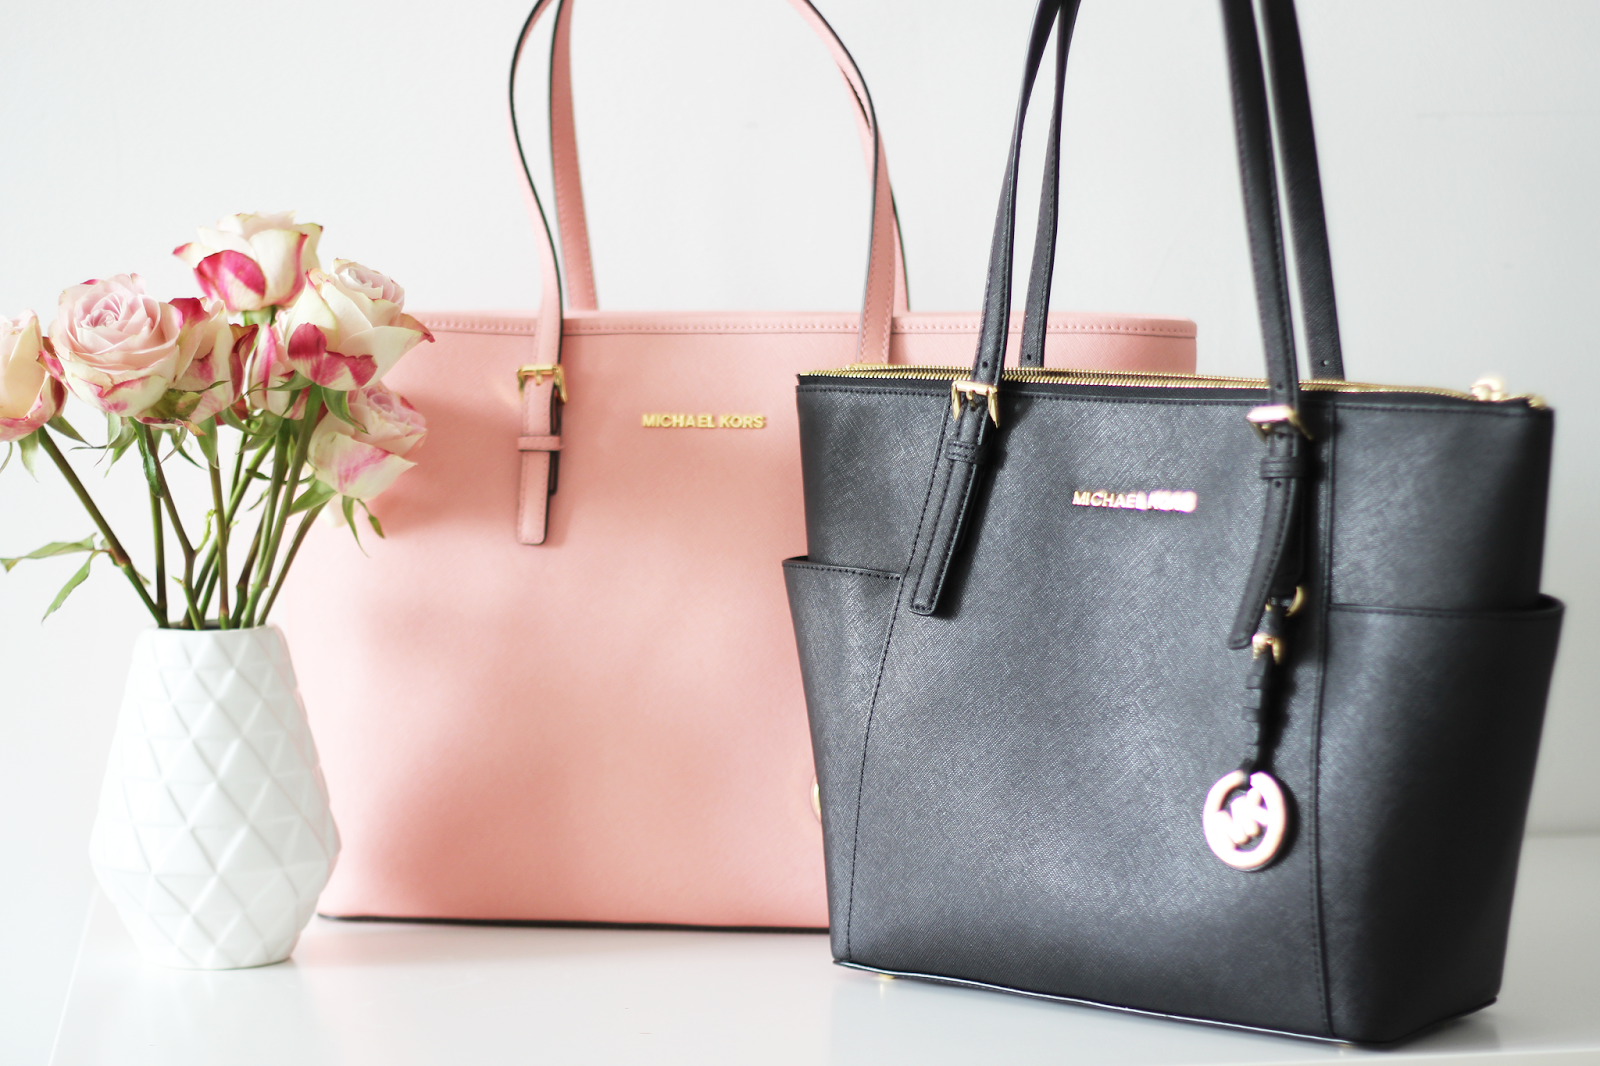 57e9abc07a8739 New In / Michael Kors Jet Set Travel Shopper #Michael #Kors #Handbag #Jet # Set #Shopper #Black #Pale #Pink #Pastel #Fashion